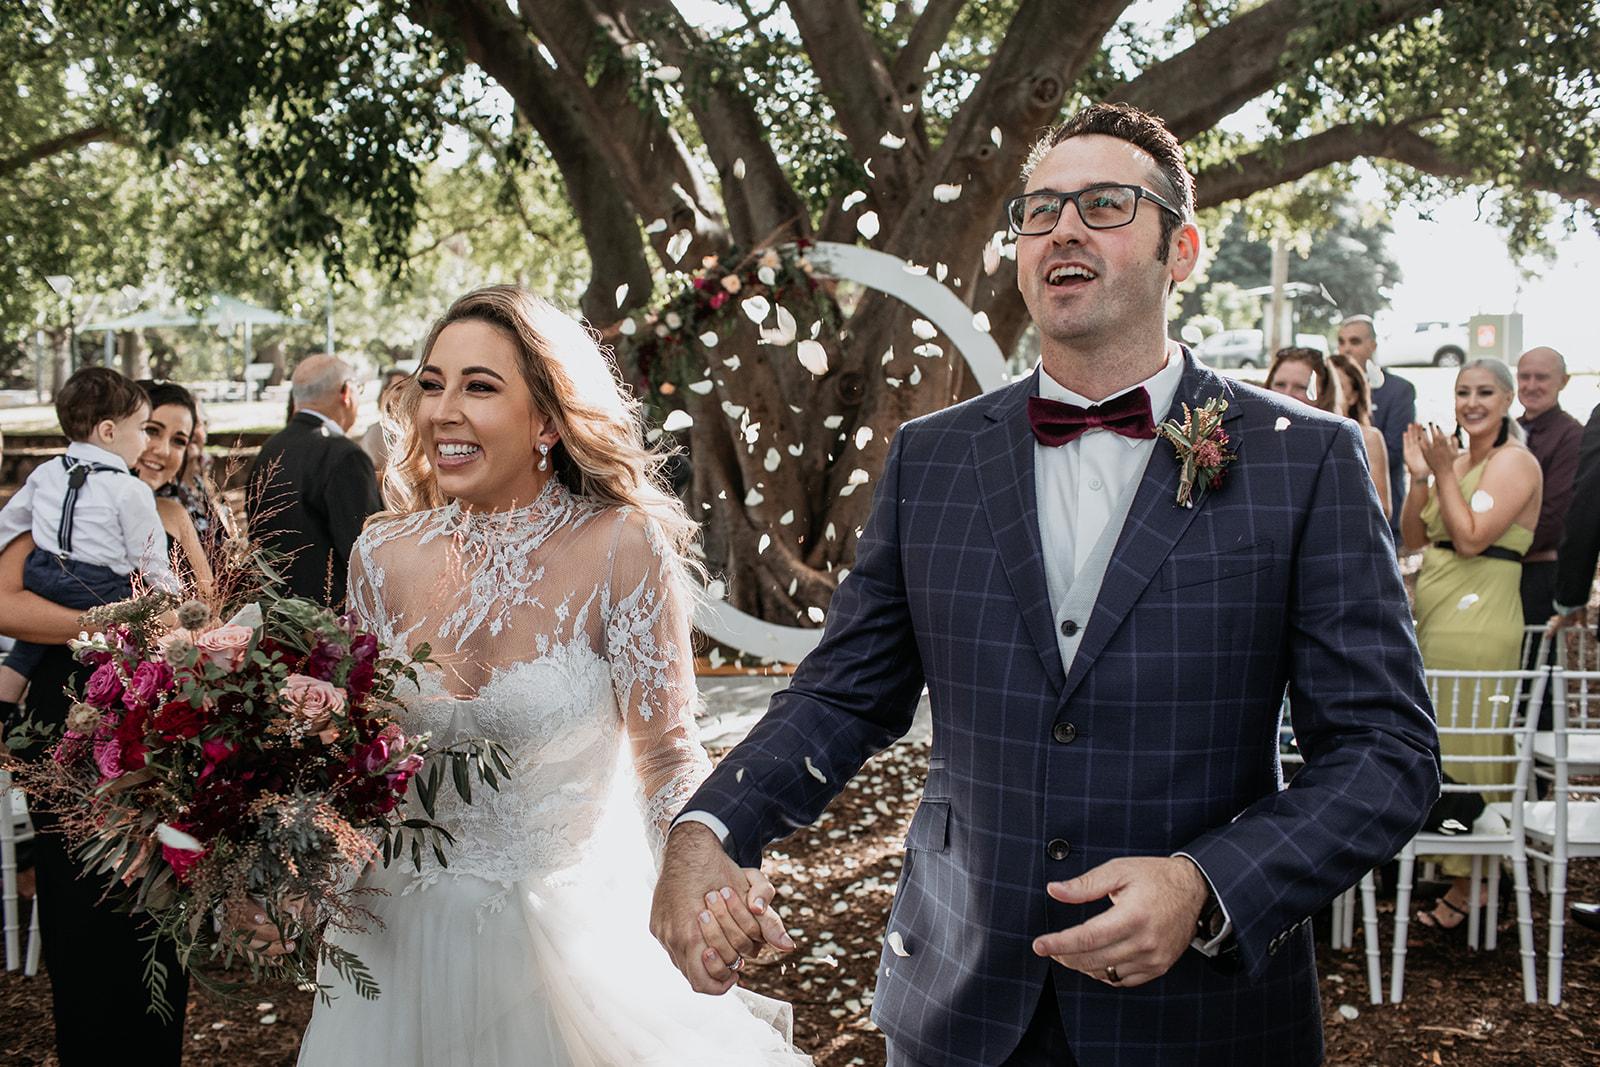 New-farm-wedding-ceremony-Brisbane